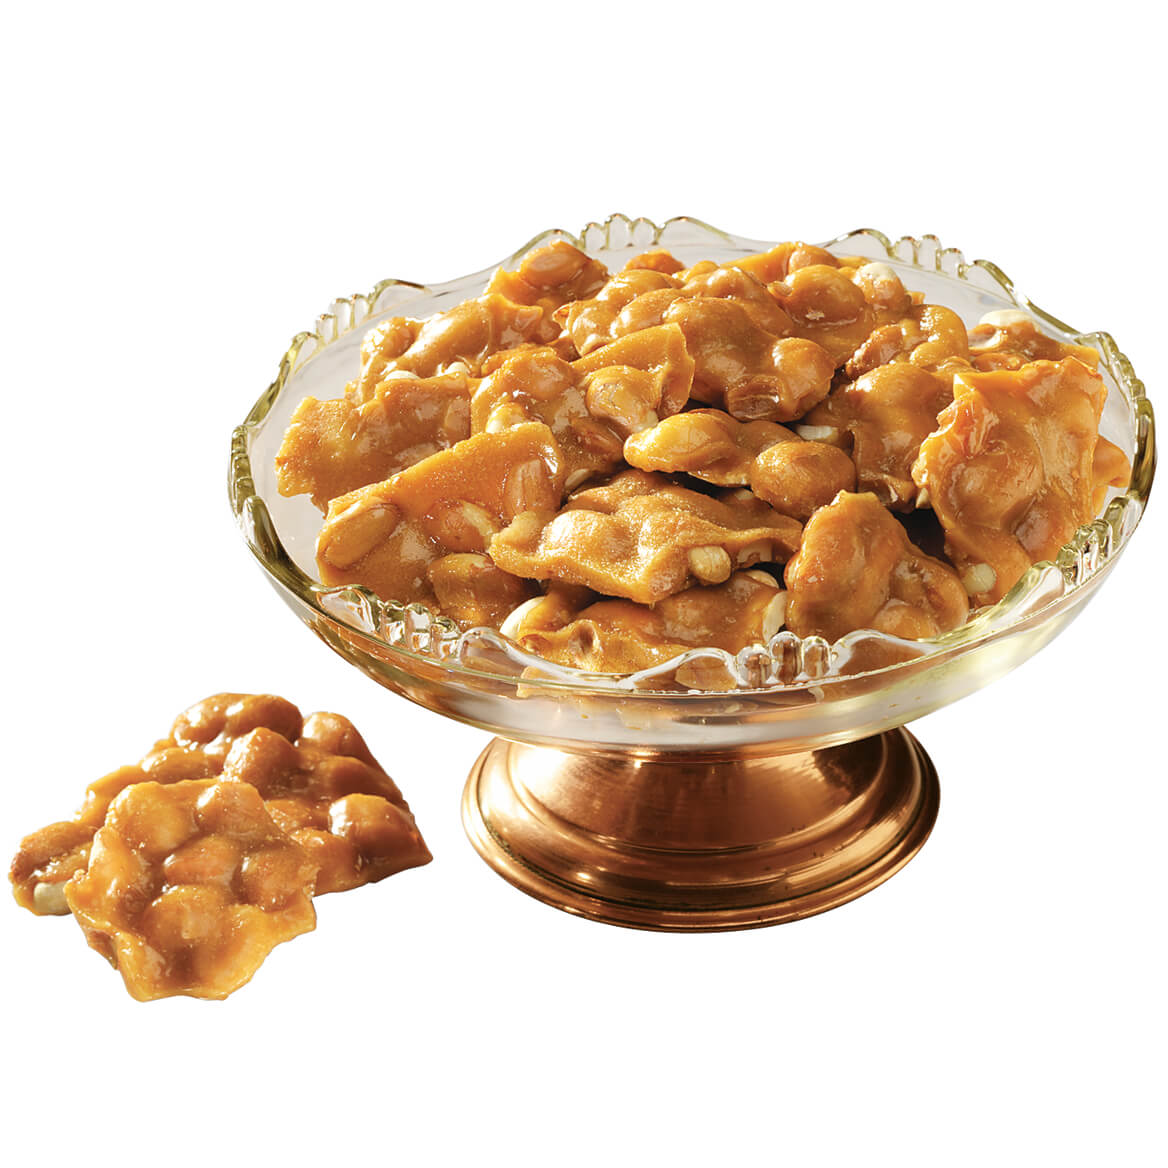 Sugar Free Peanut Brittle Tin 12 oz.-315090